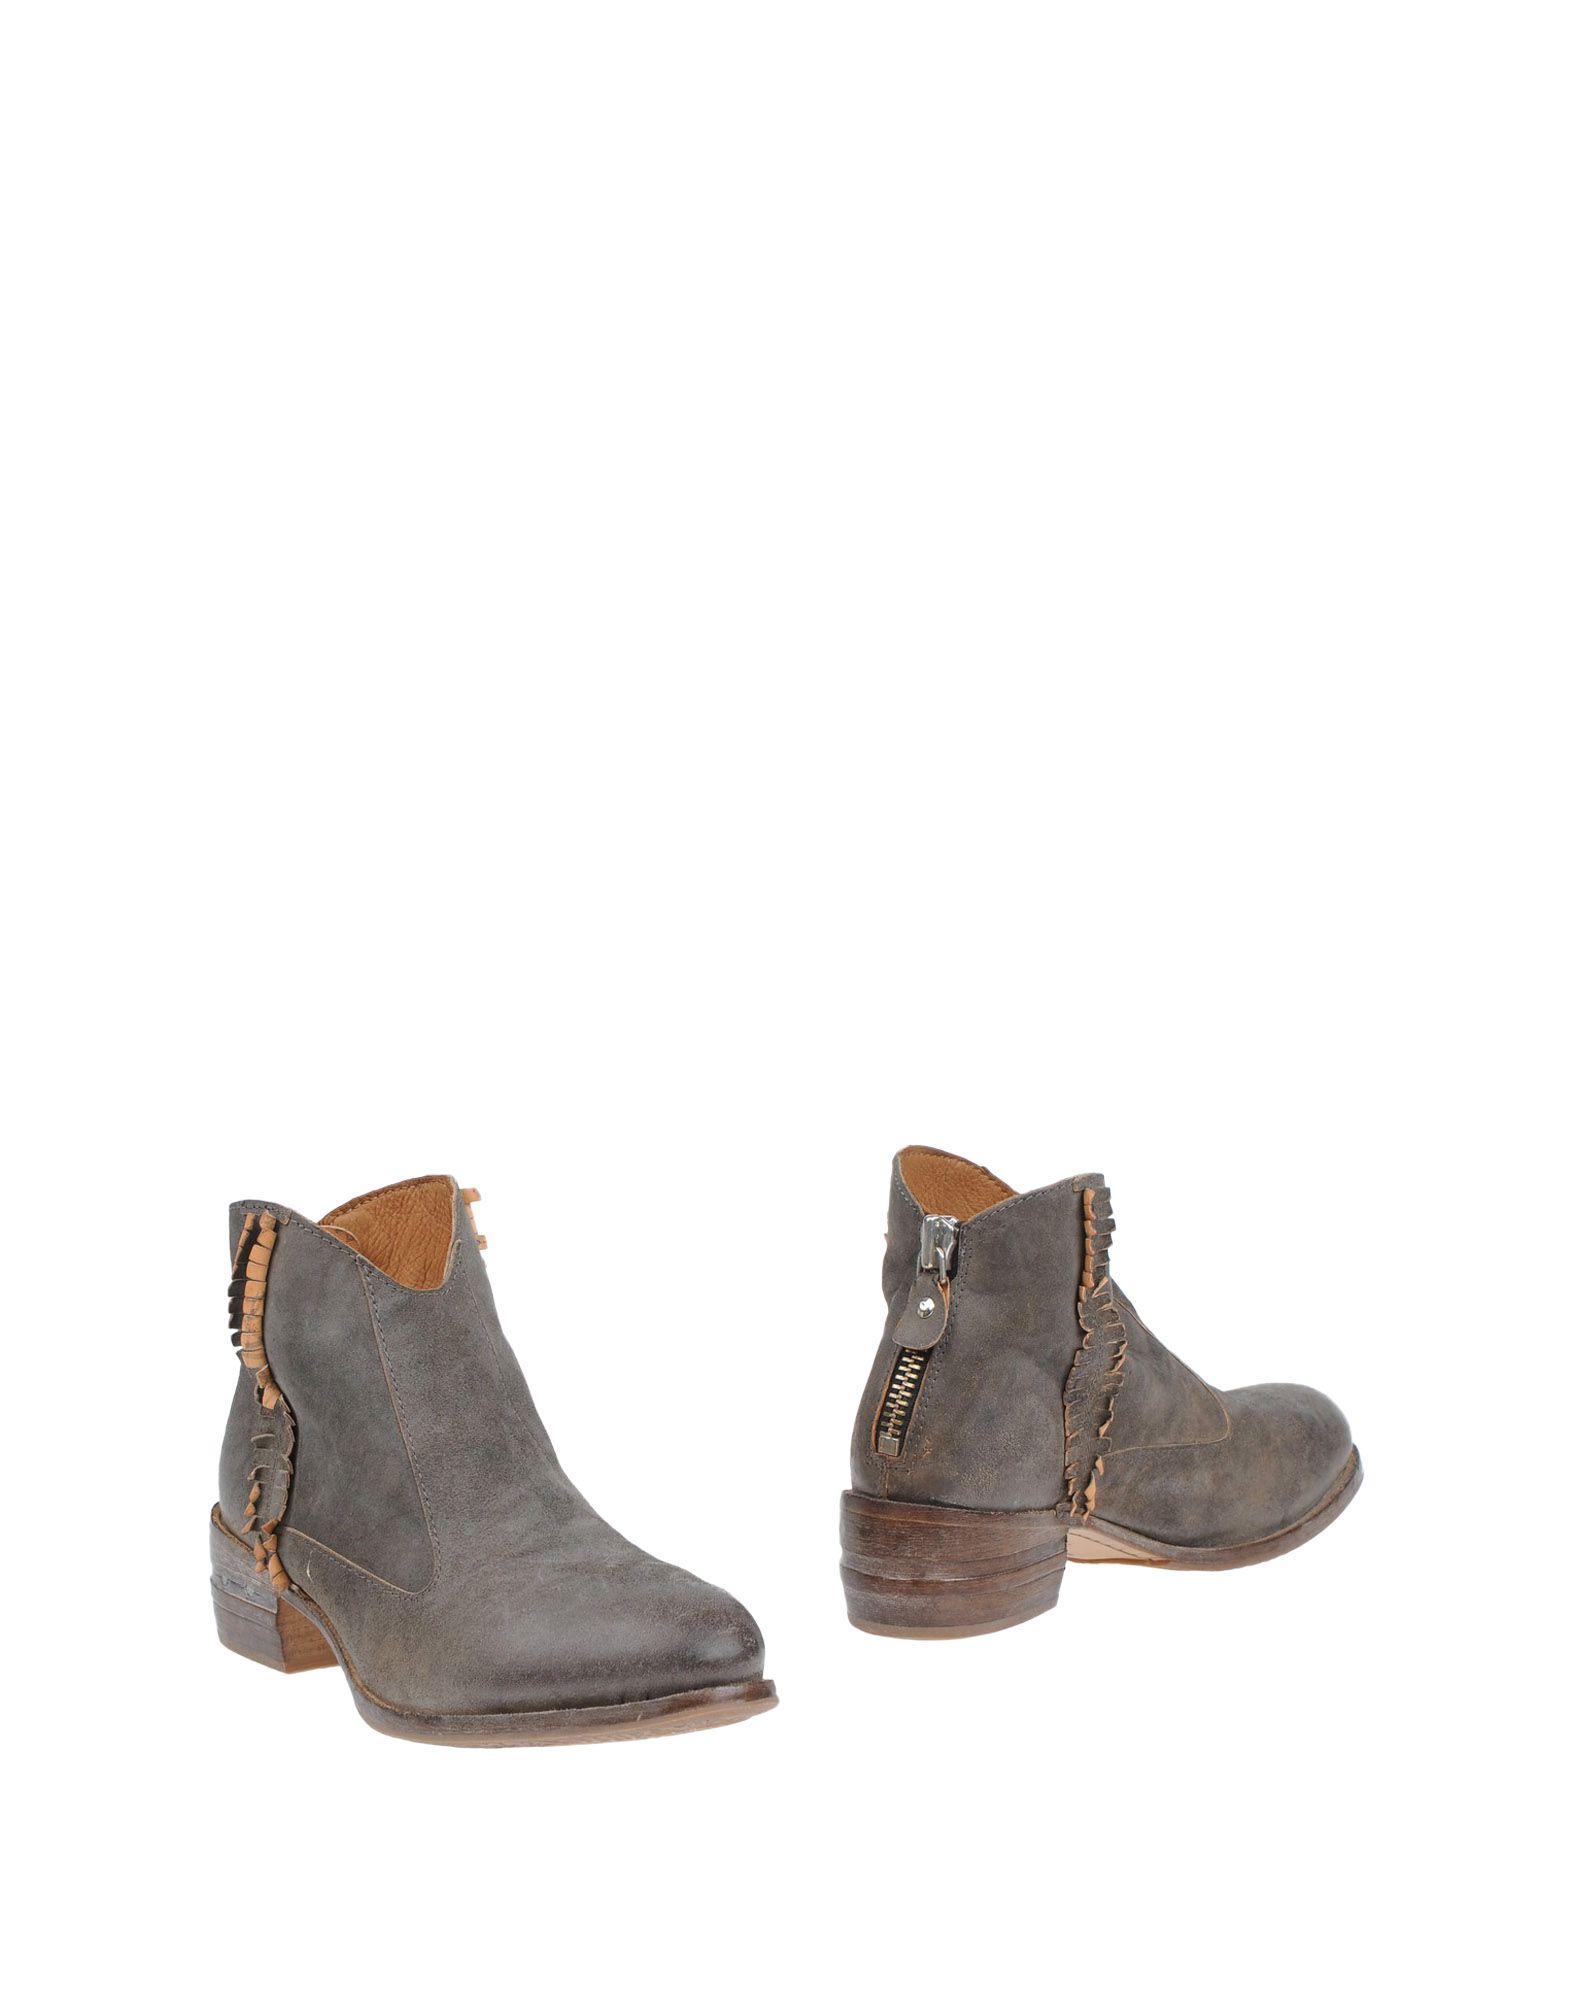 Moma Stiefelette Schuhe Damen  11327135CV Heiße Schuhe Stiefelette 15d5dd